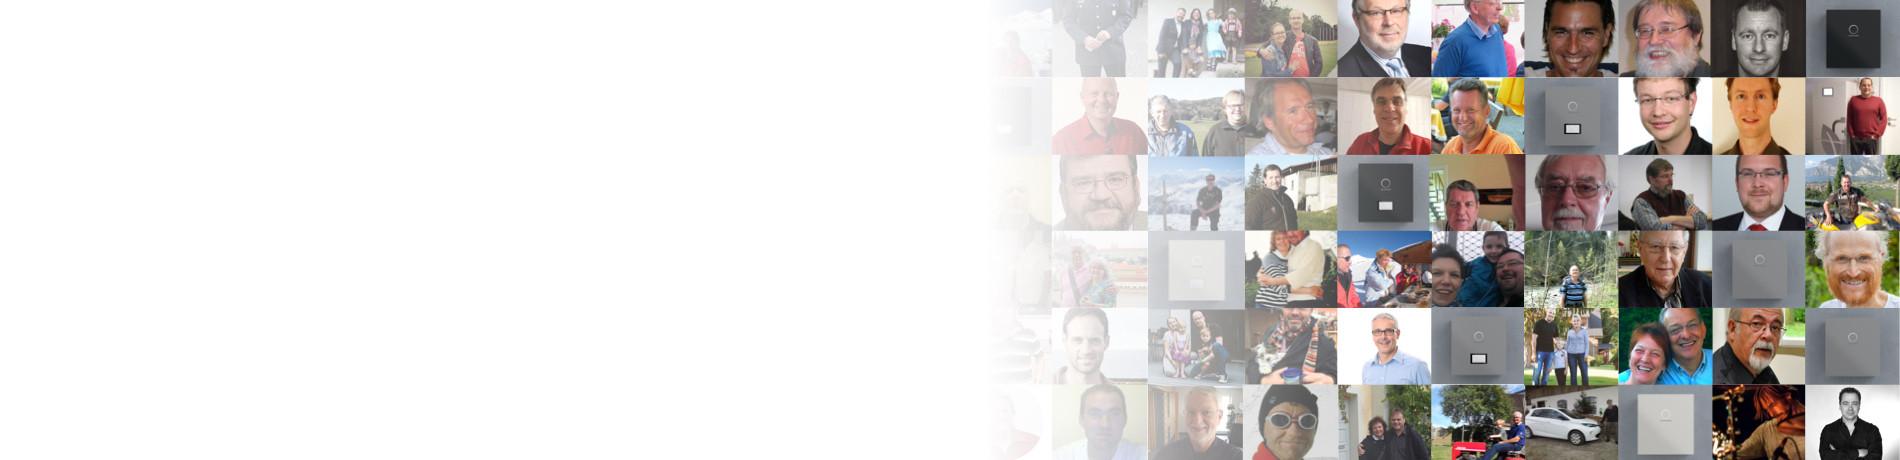 Gemeinschaft sonnenCommunity Mosaik Portraits